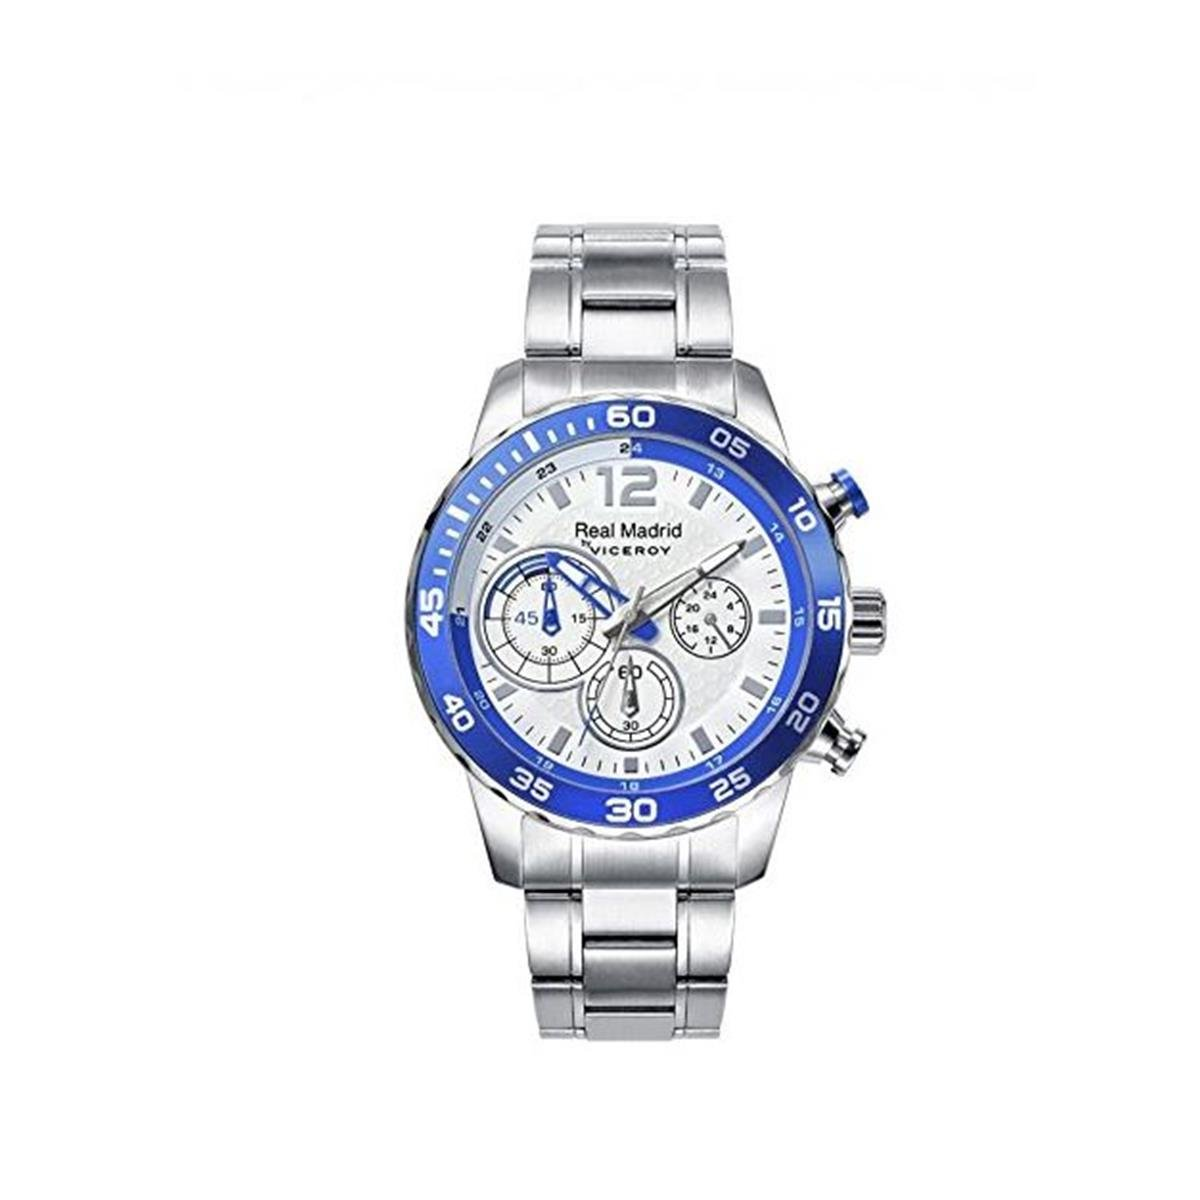 Amazon.com: Reloj Viceroy R. Madrid 40965 – 05 Hombre Crono ...